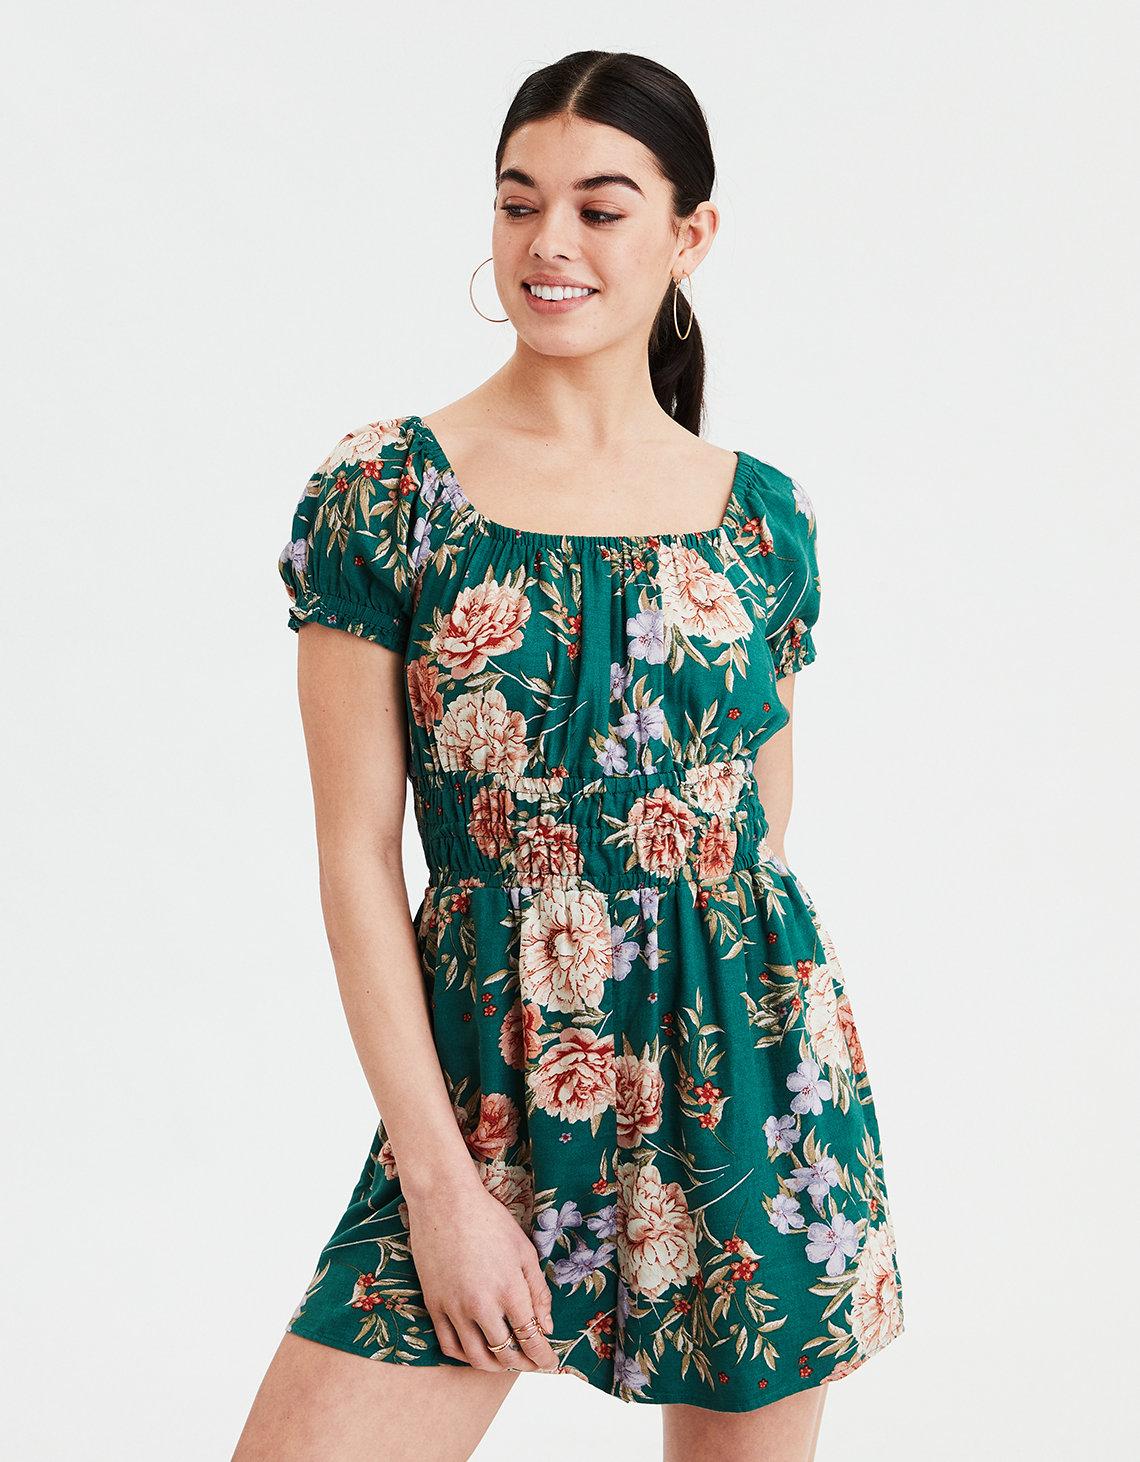 6473ceb2d339 AE Puff Sleeve Floral Romper